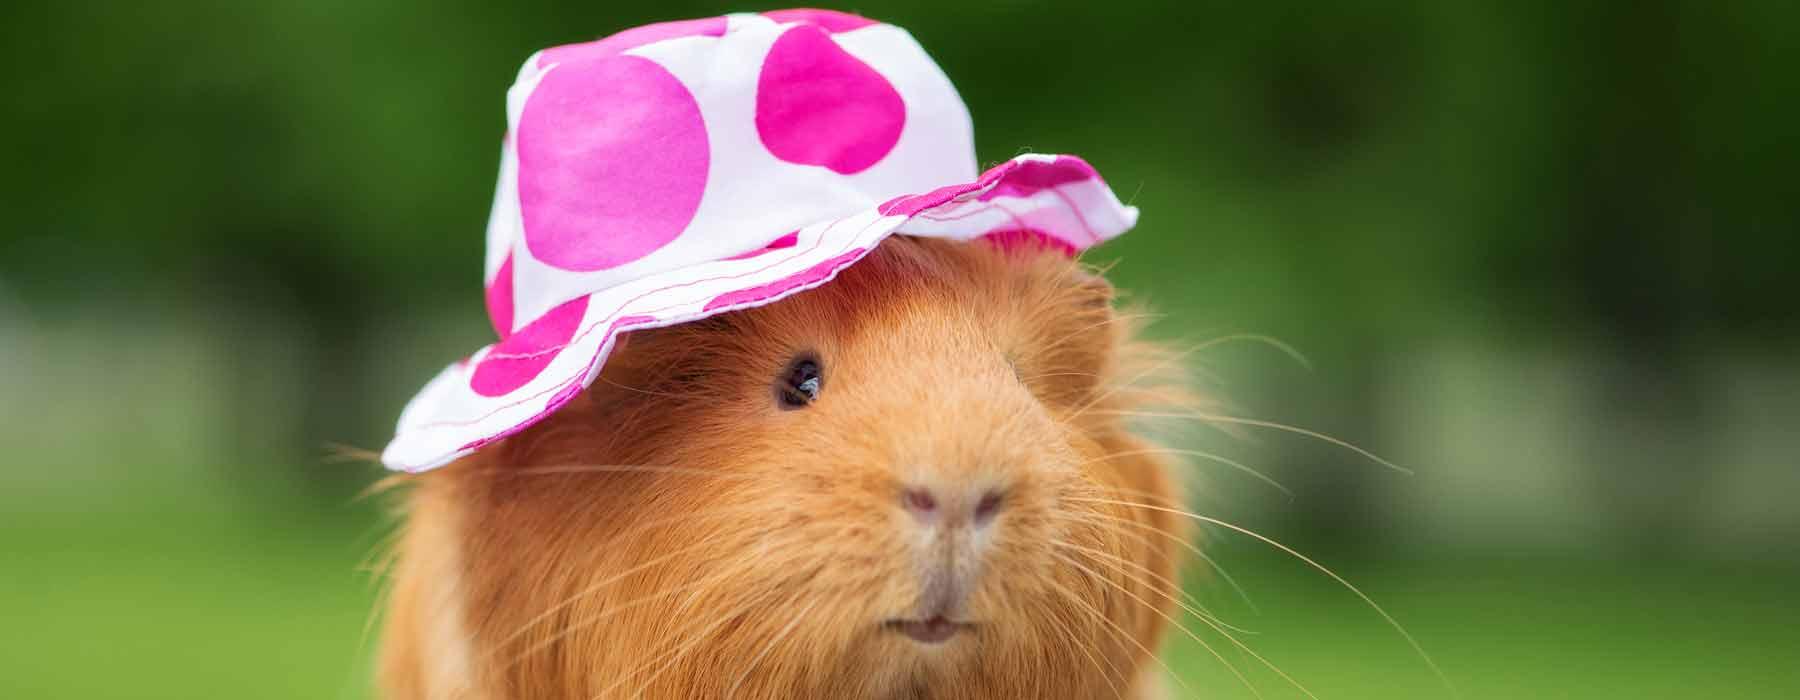 Guinea pig wearing a sun hat